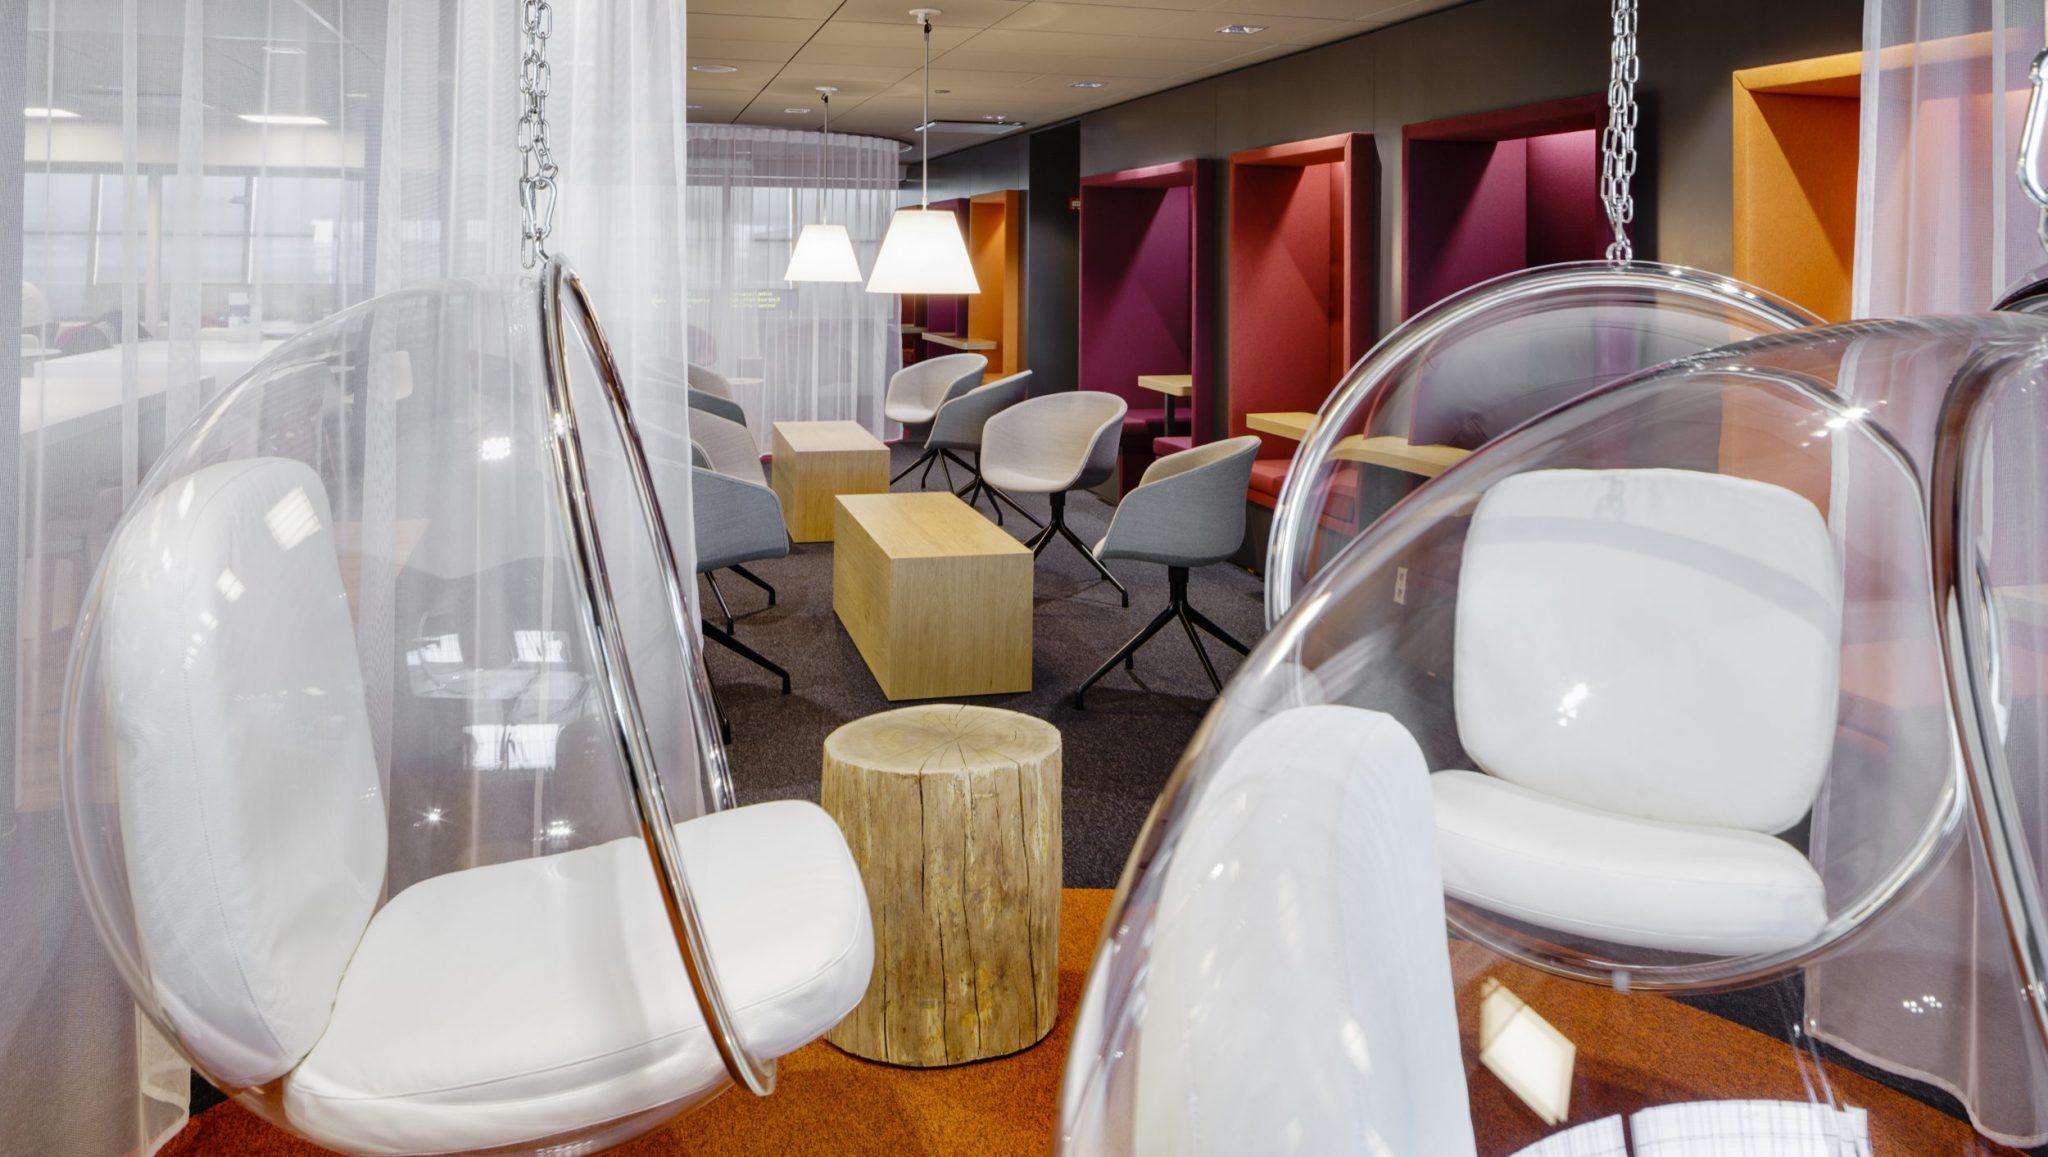 Servisair-Aspire-Airport-Lounge-Helsinki-Vantaa-GI-Project-4